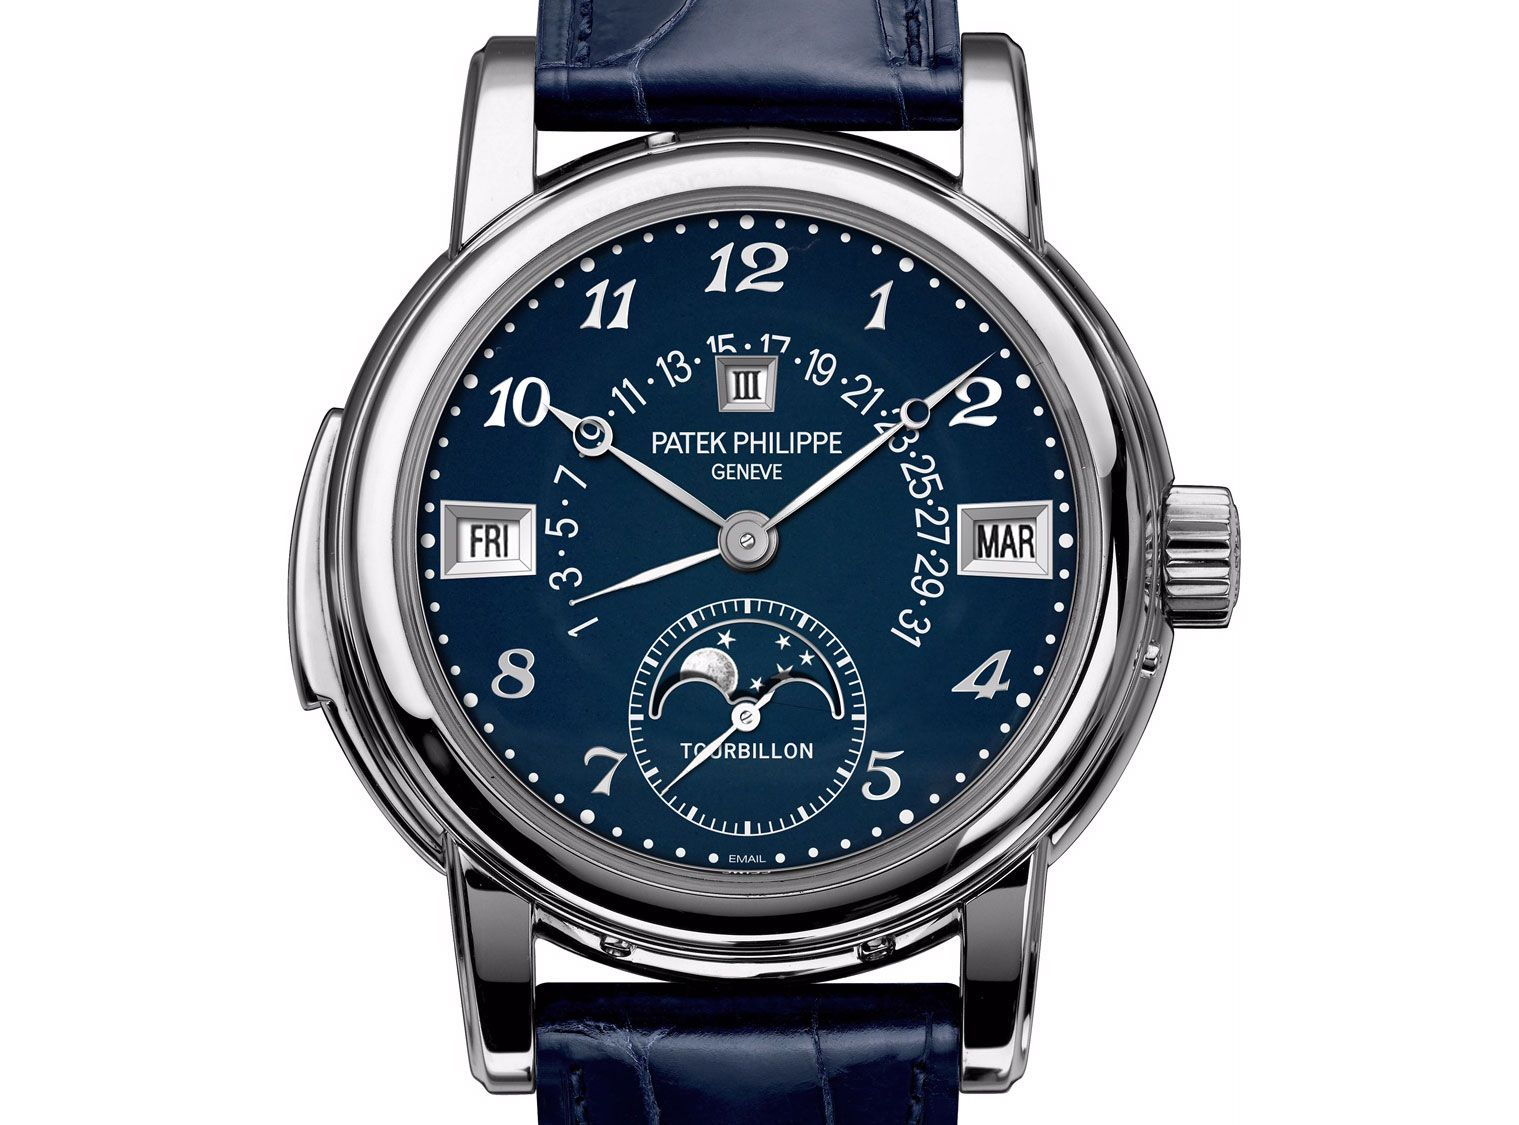 Dunyanin En Pahali Saati Patek Philipe Imzasi Tasiyor The Most Expensive Wrist Watch By Patek Philipe Patek Philippe Luks Saatler Erkek Saat